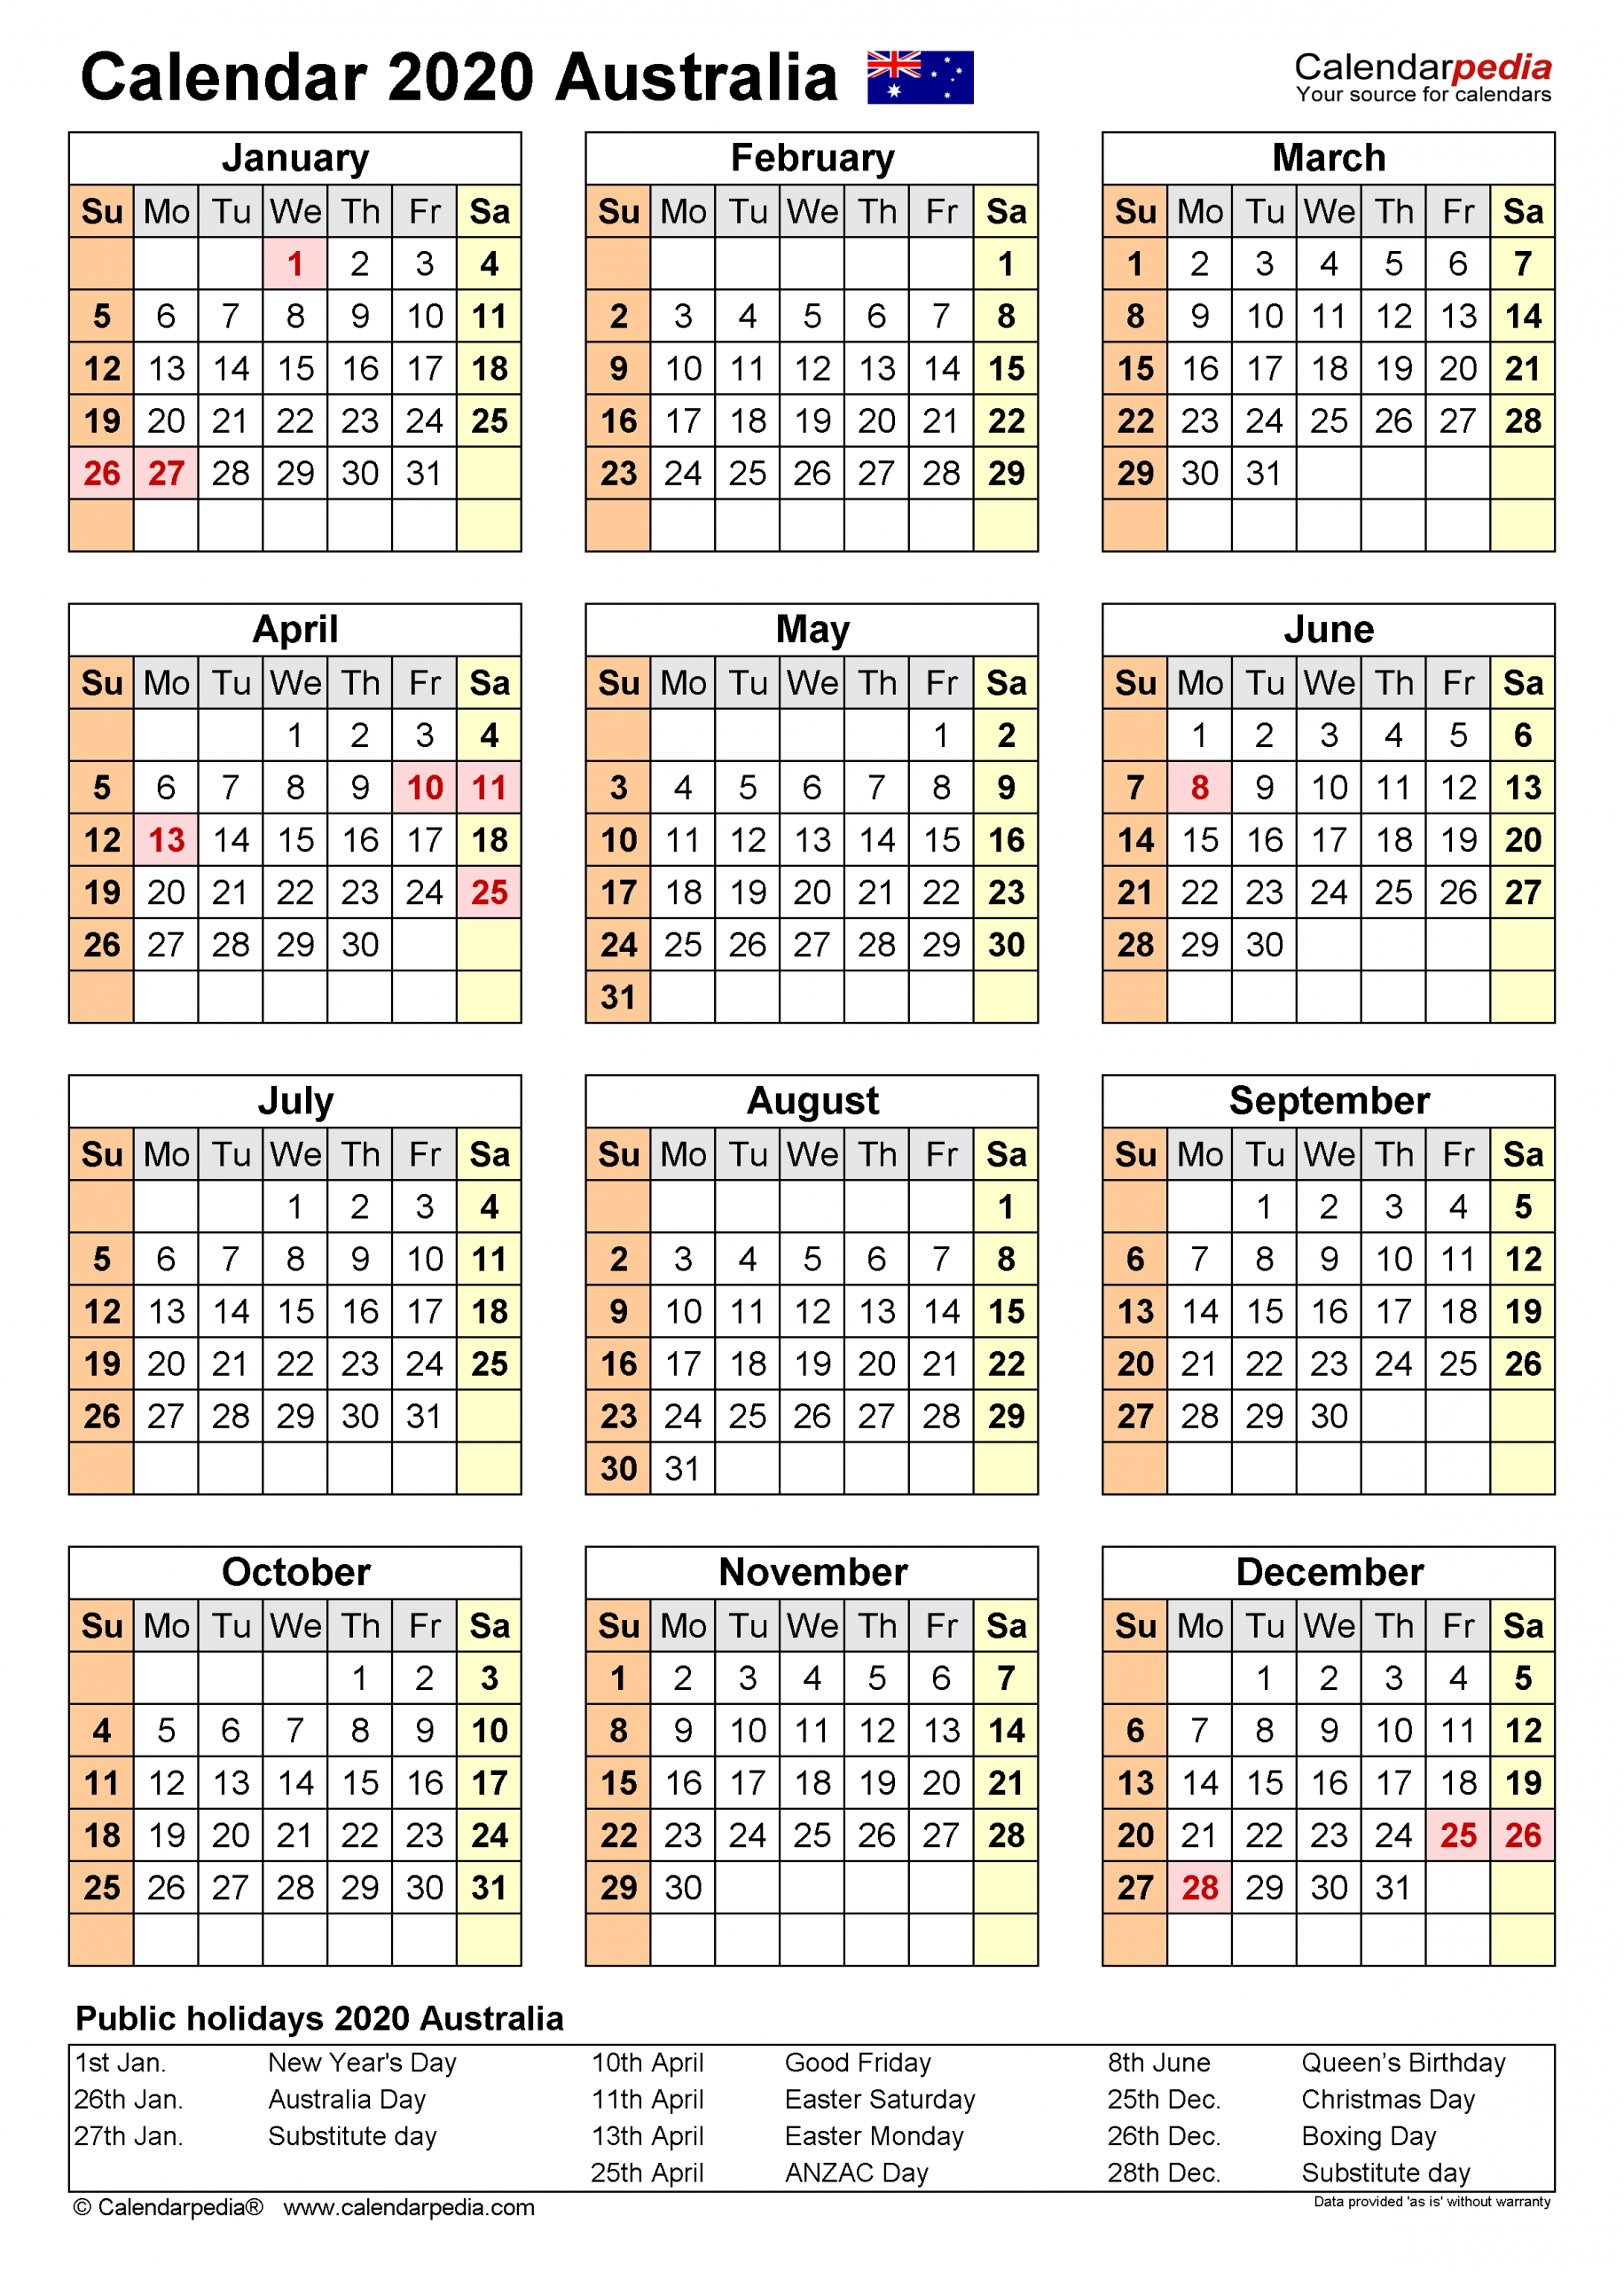 Australia Calendar 2020 - Free Printable Pdf Templates  What Financial Year In Australia